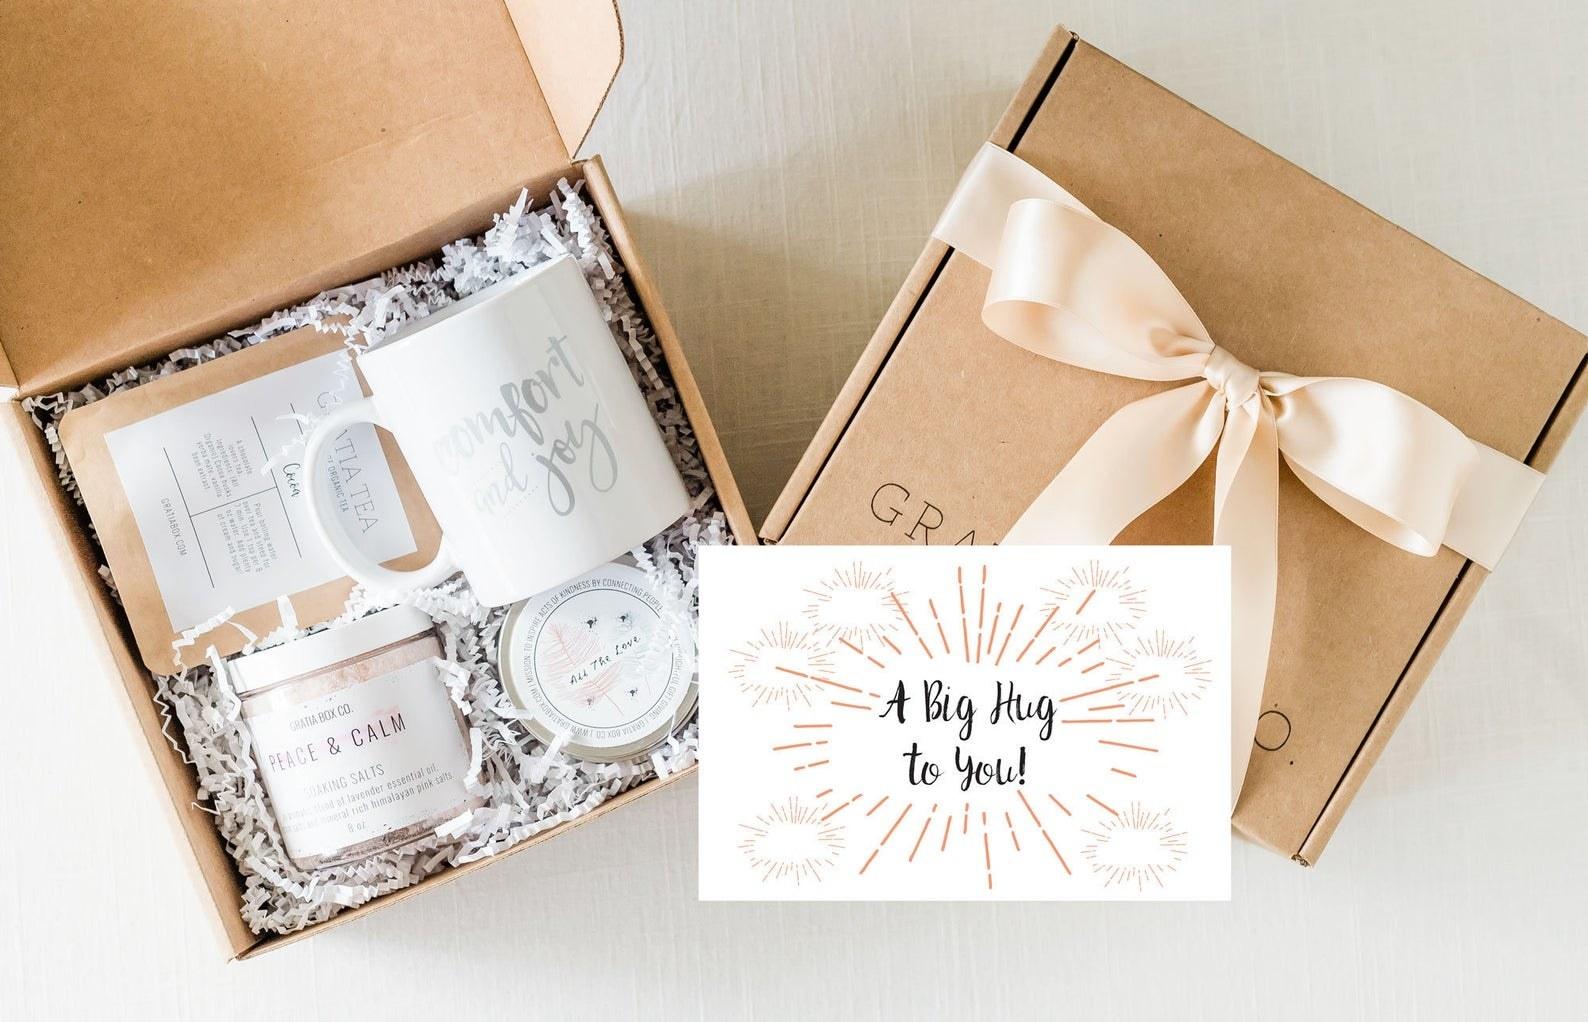 gift box open with mug, scrub, and tea